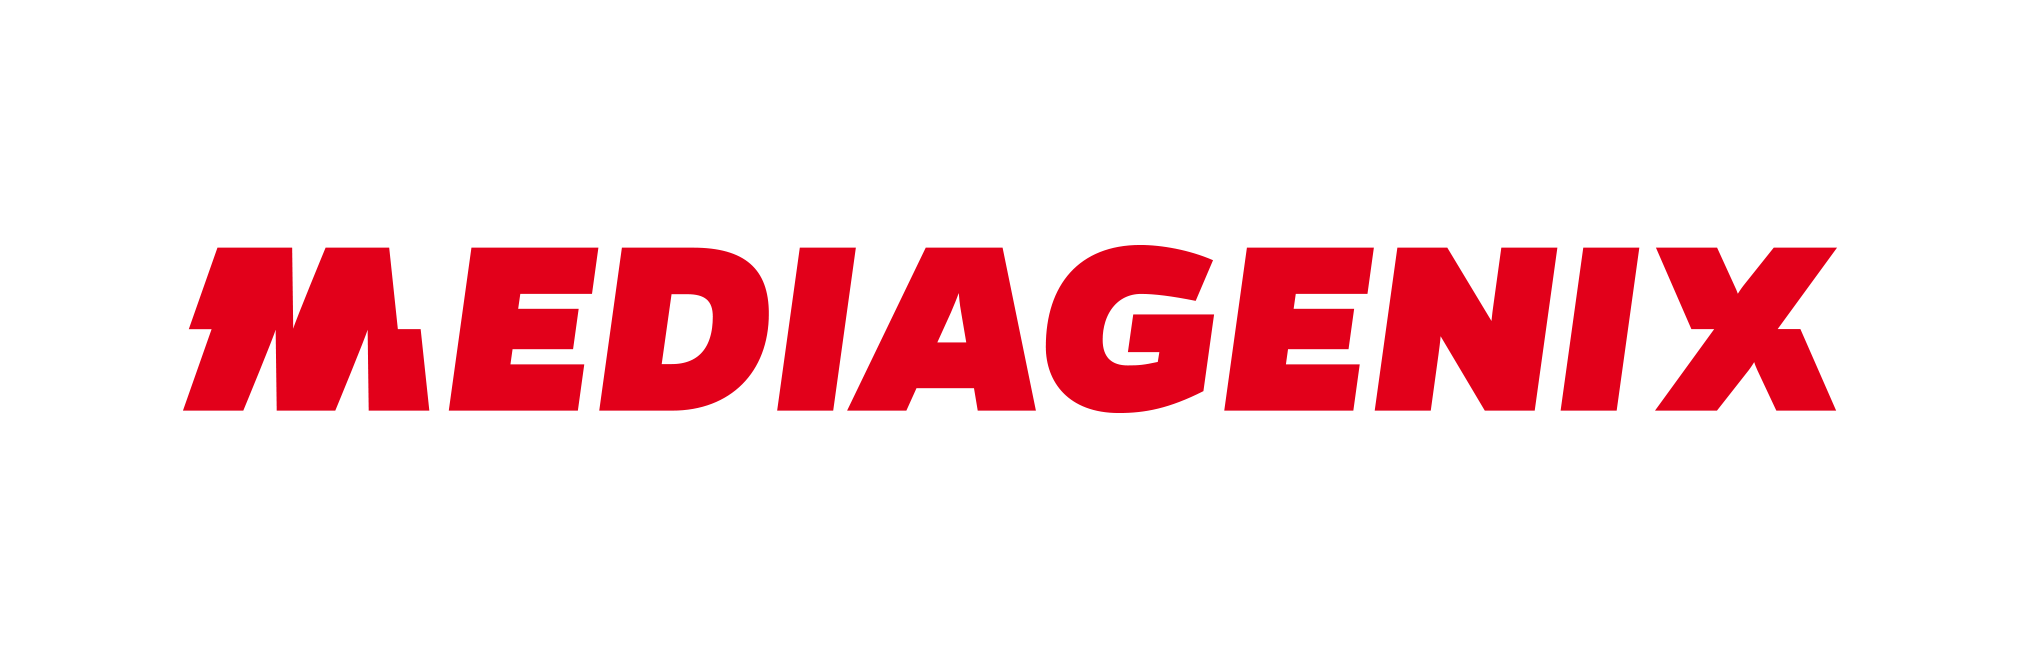 MEDIAGENIX logo